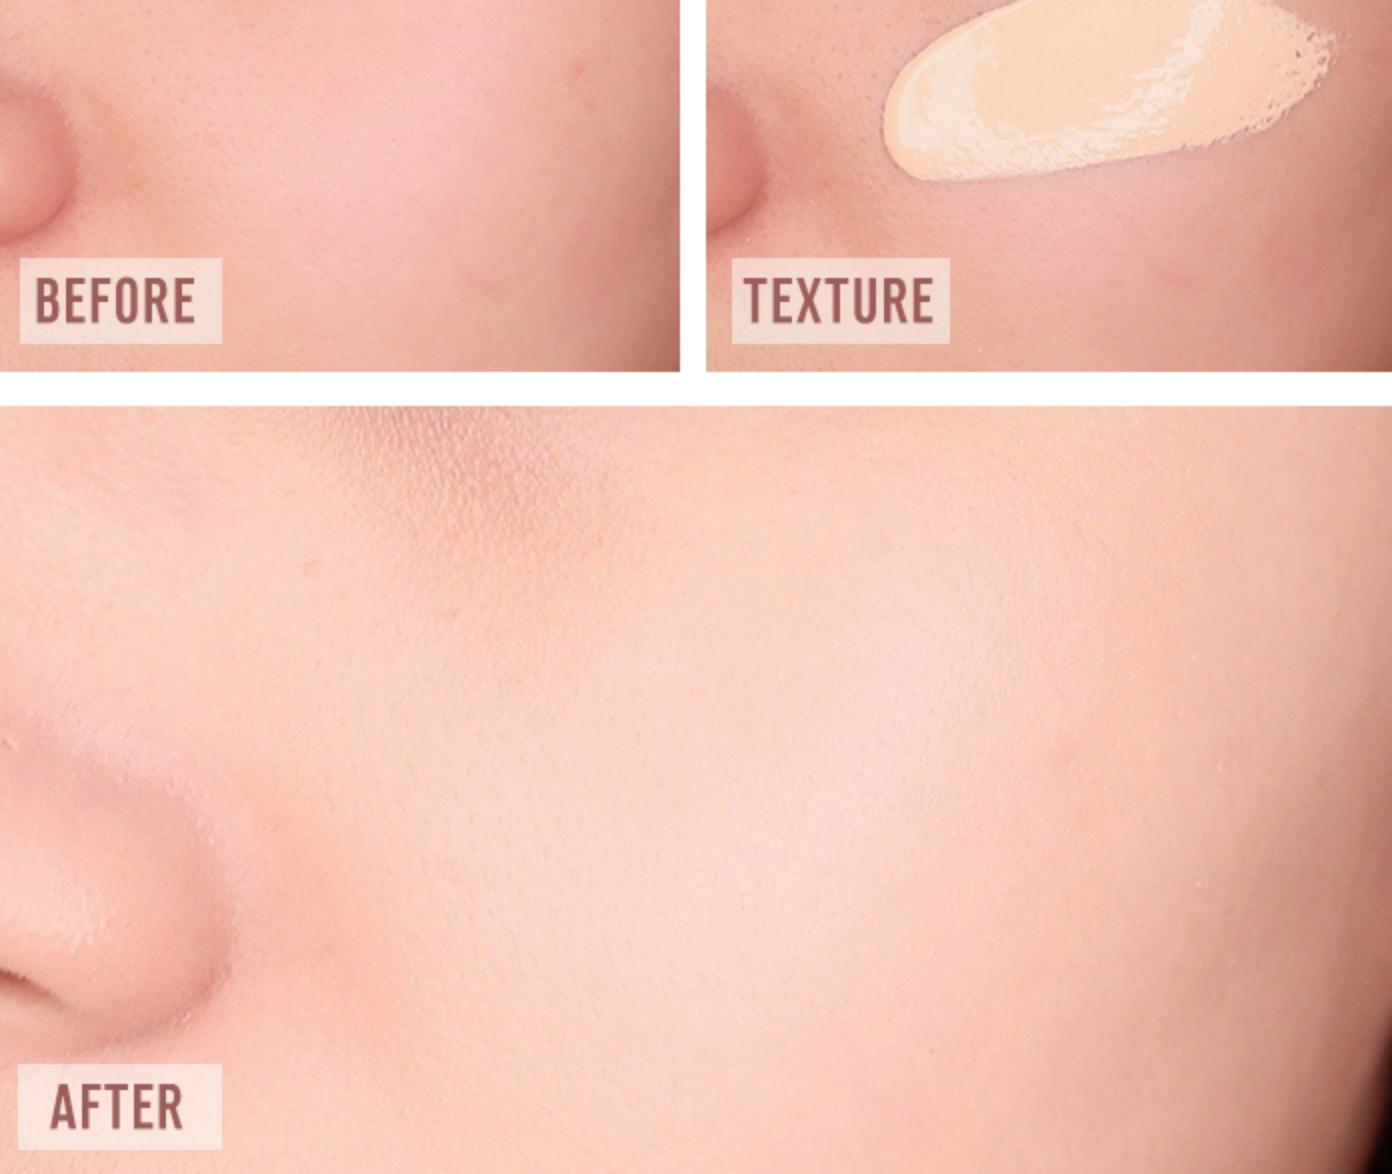 espoir-skin-like-tinted-moisturizer-spf50-pa-01.png